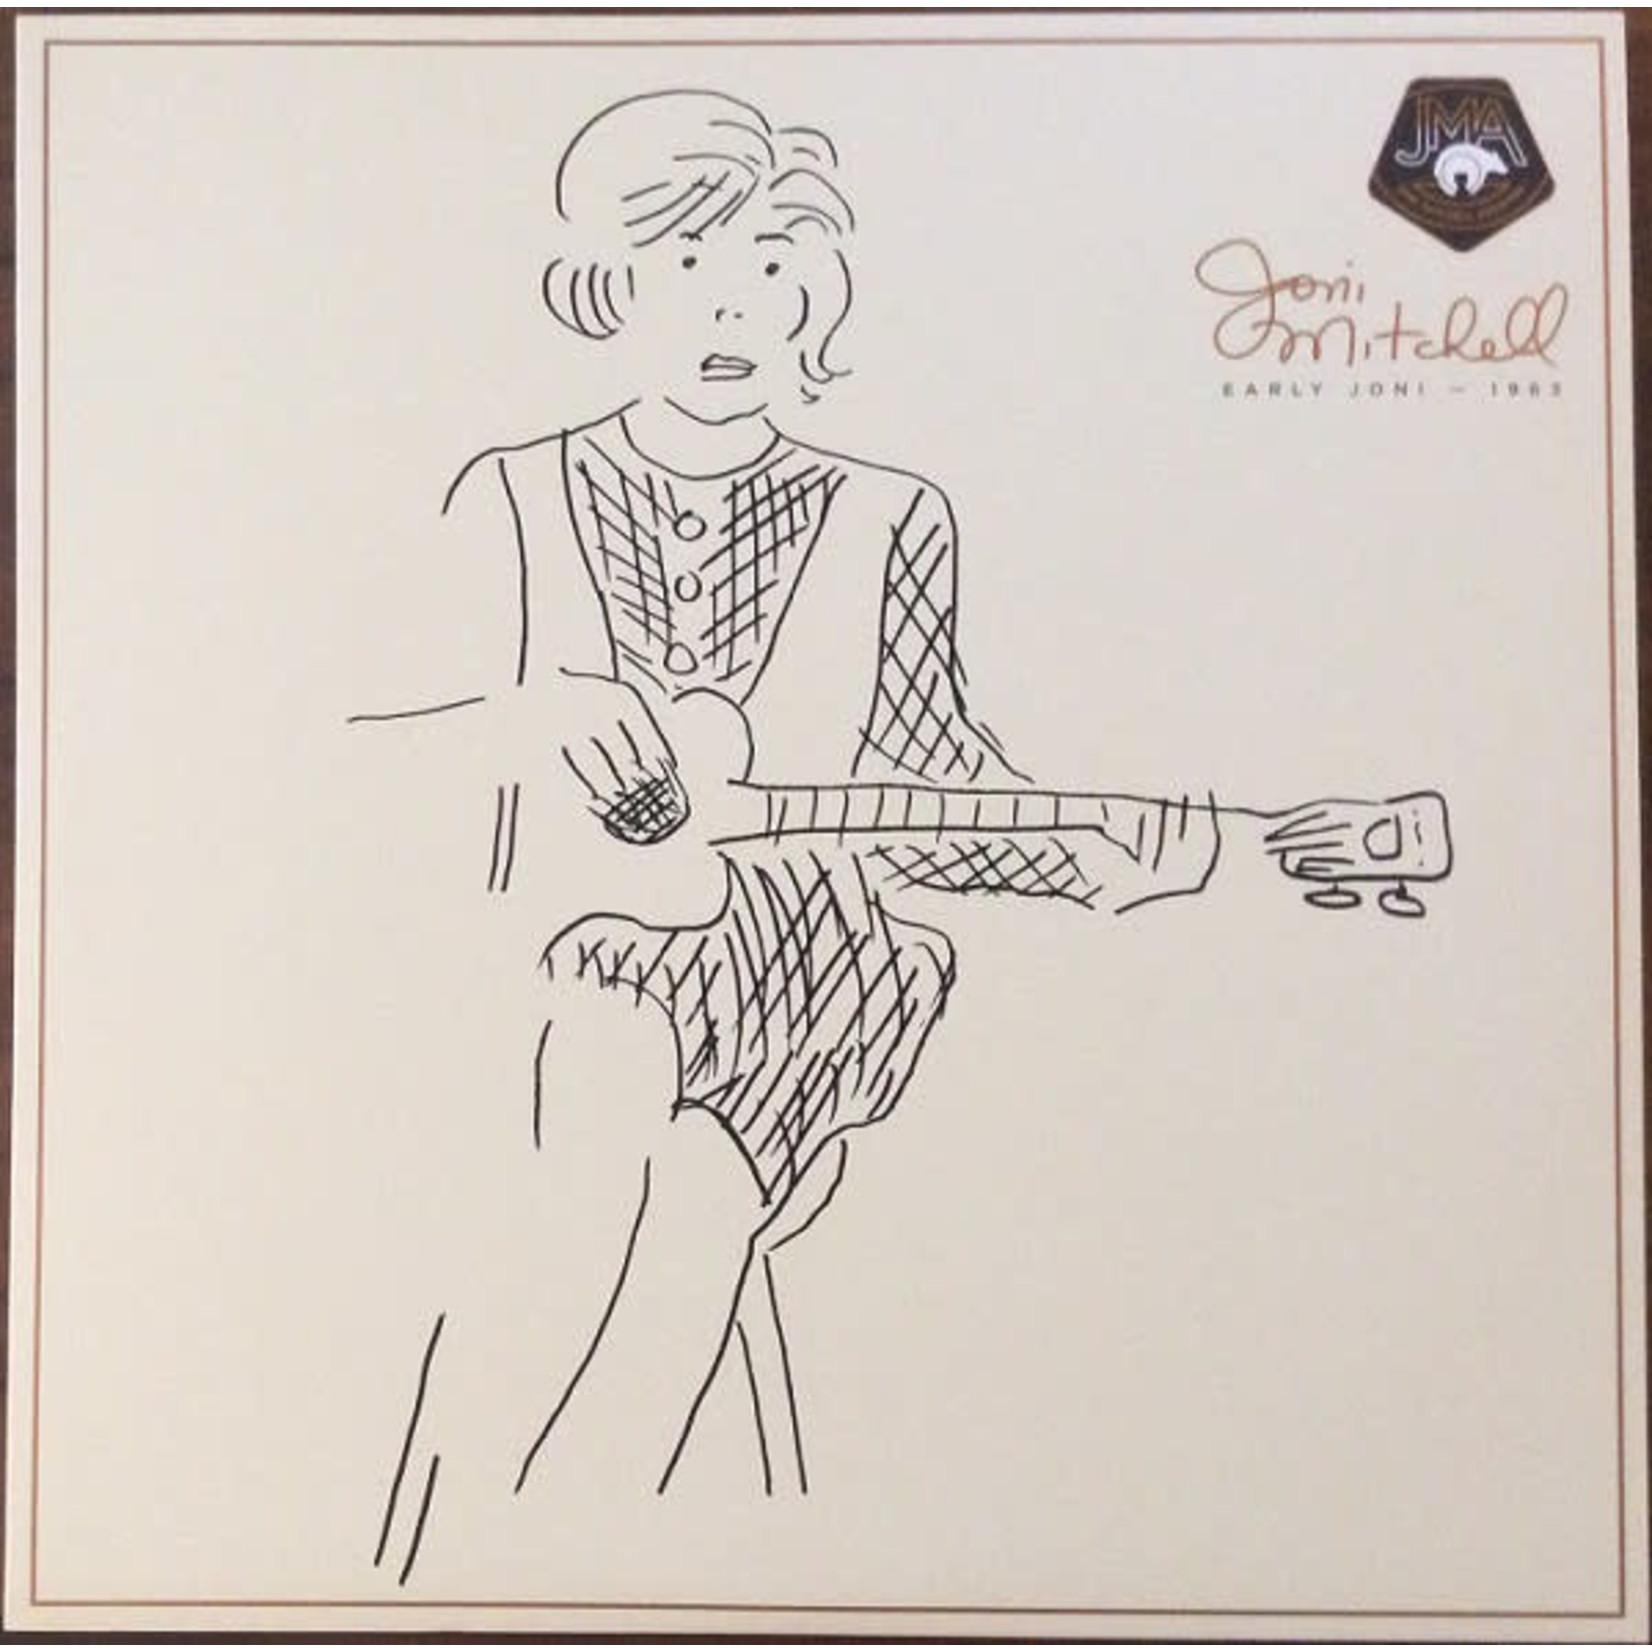 JONI MITCHELL EARLY JONI – 1963 (LP)